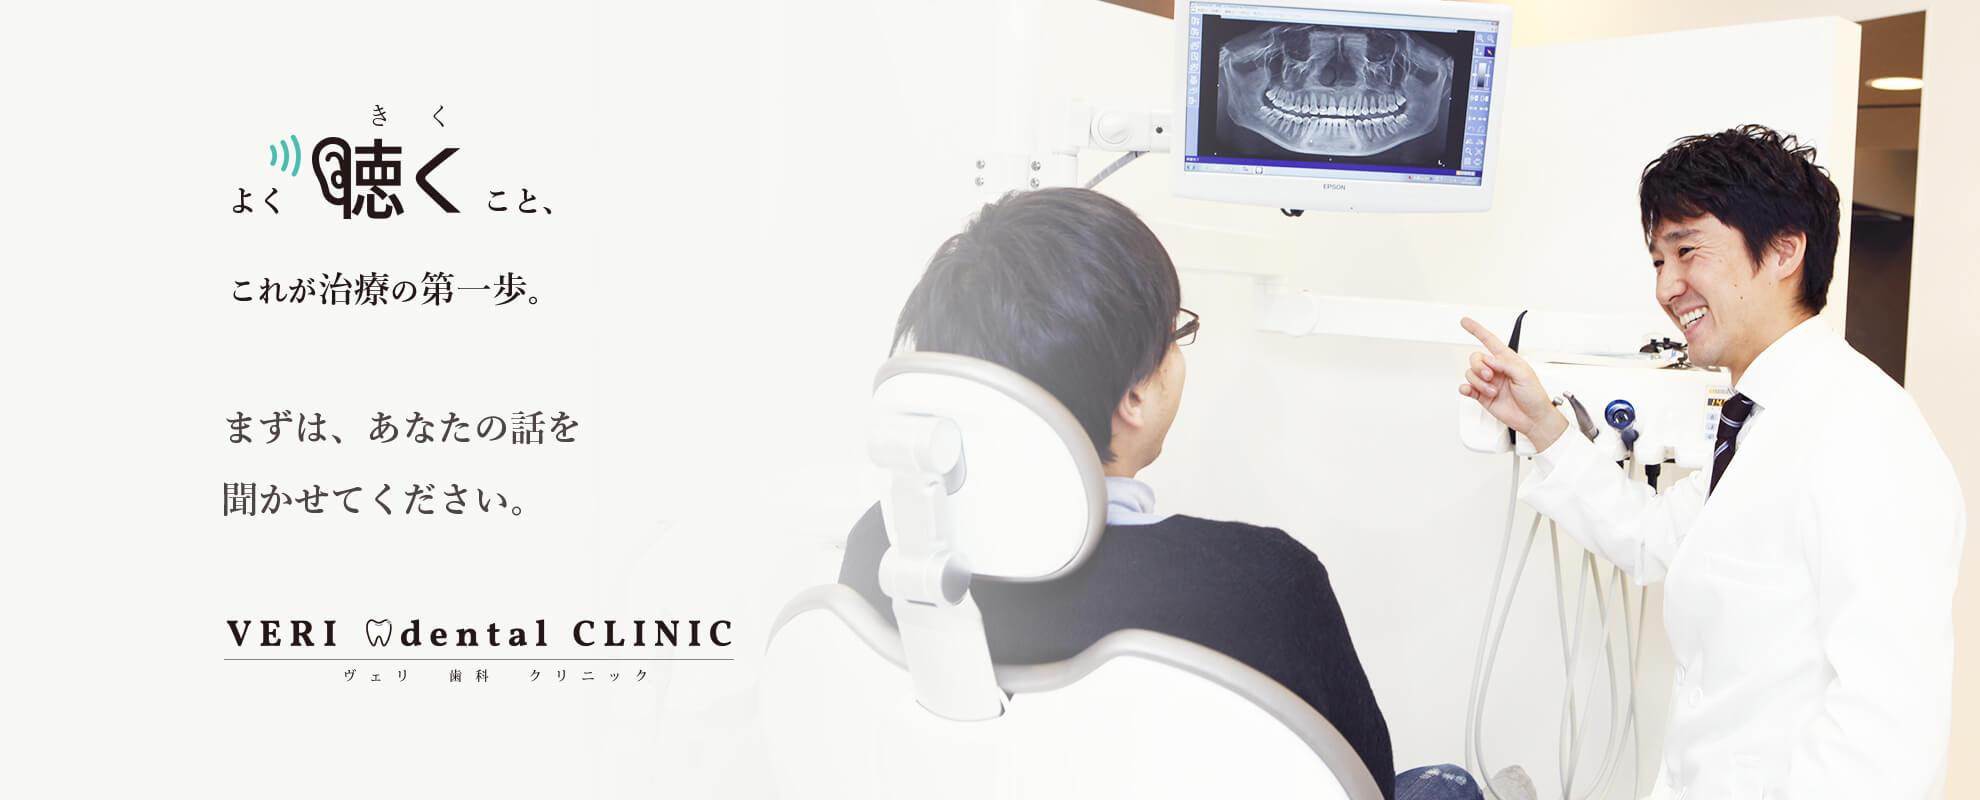 veri-dental-header-image